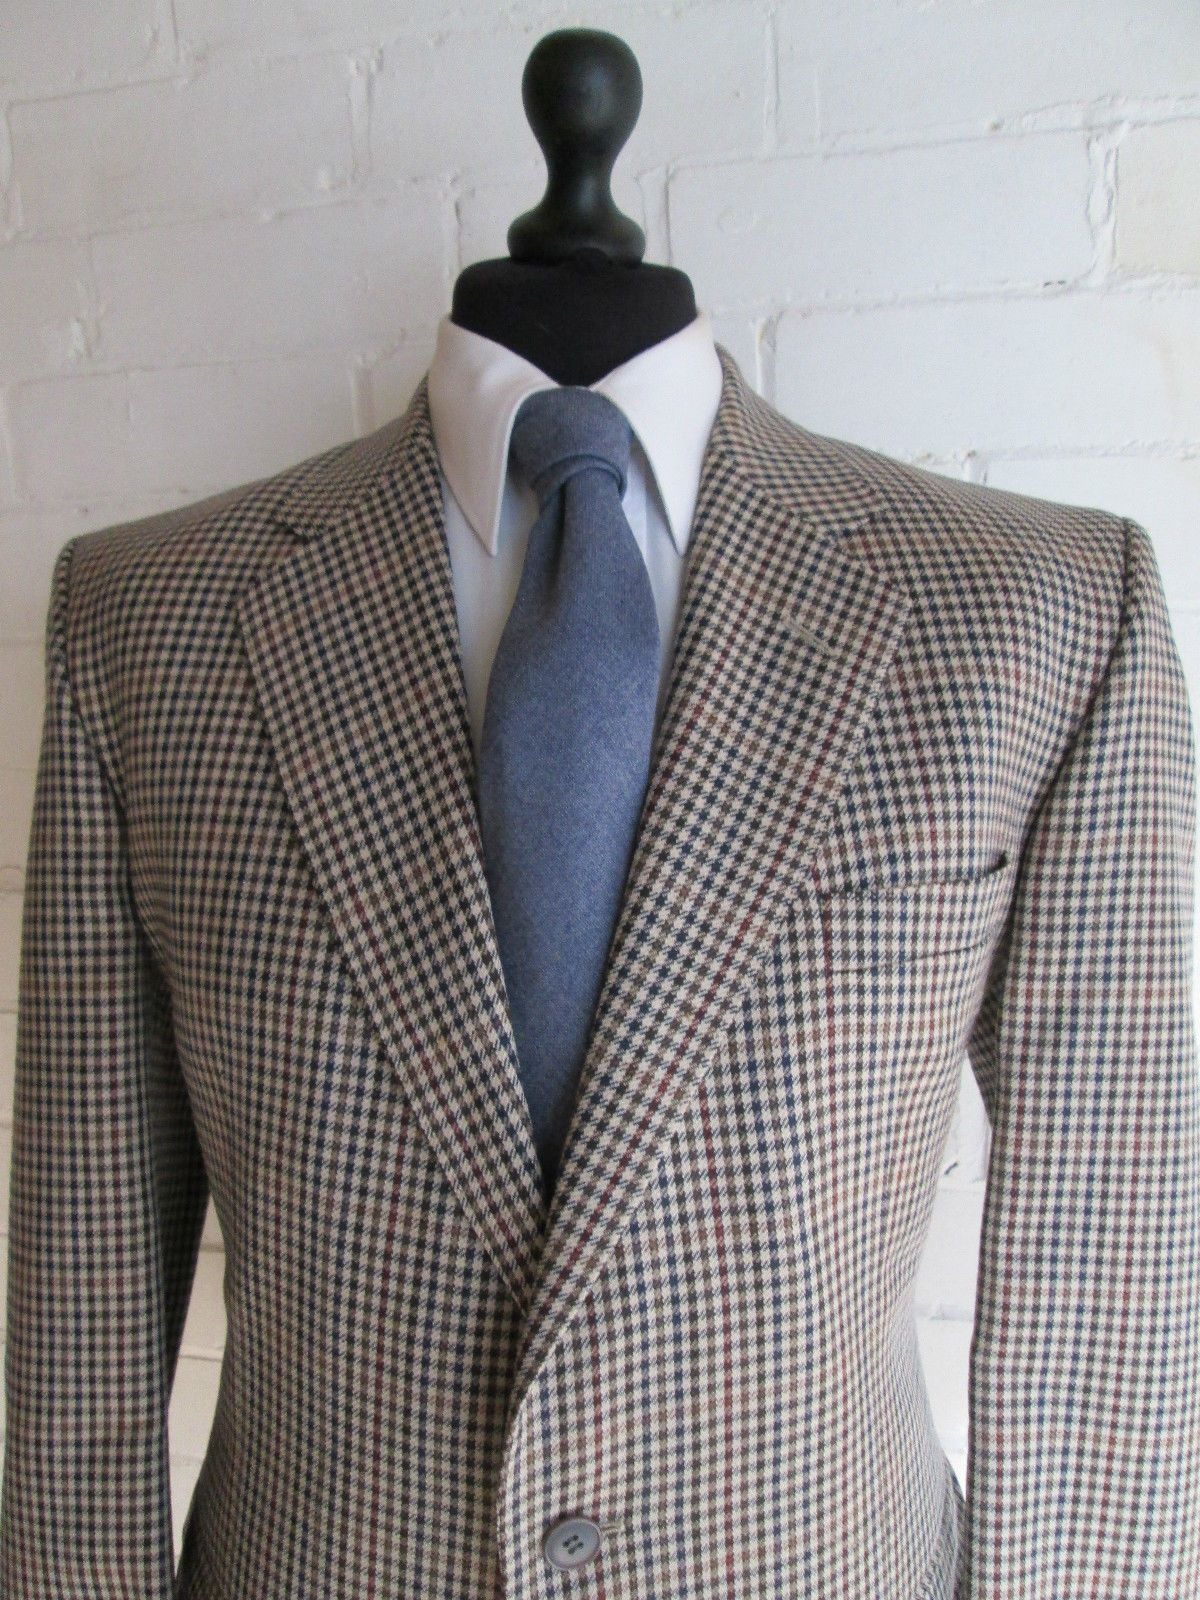 Harris Tweed Lands' End Men's Sport Jacket. Size 43 Regular Pure Wool Gray Blue Olive Barleycorn Tweed Sport Coat. Gentleman Gifts for Him Uxd2p,